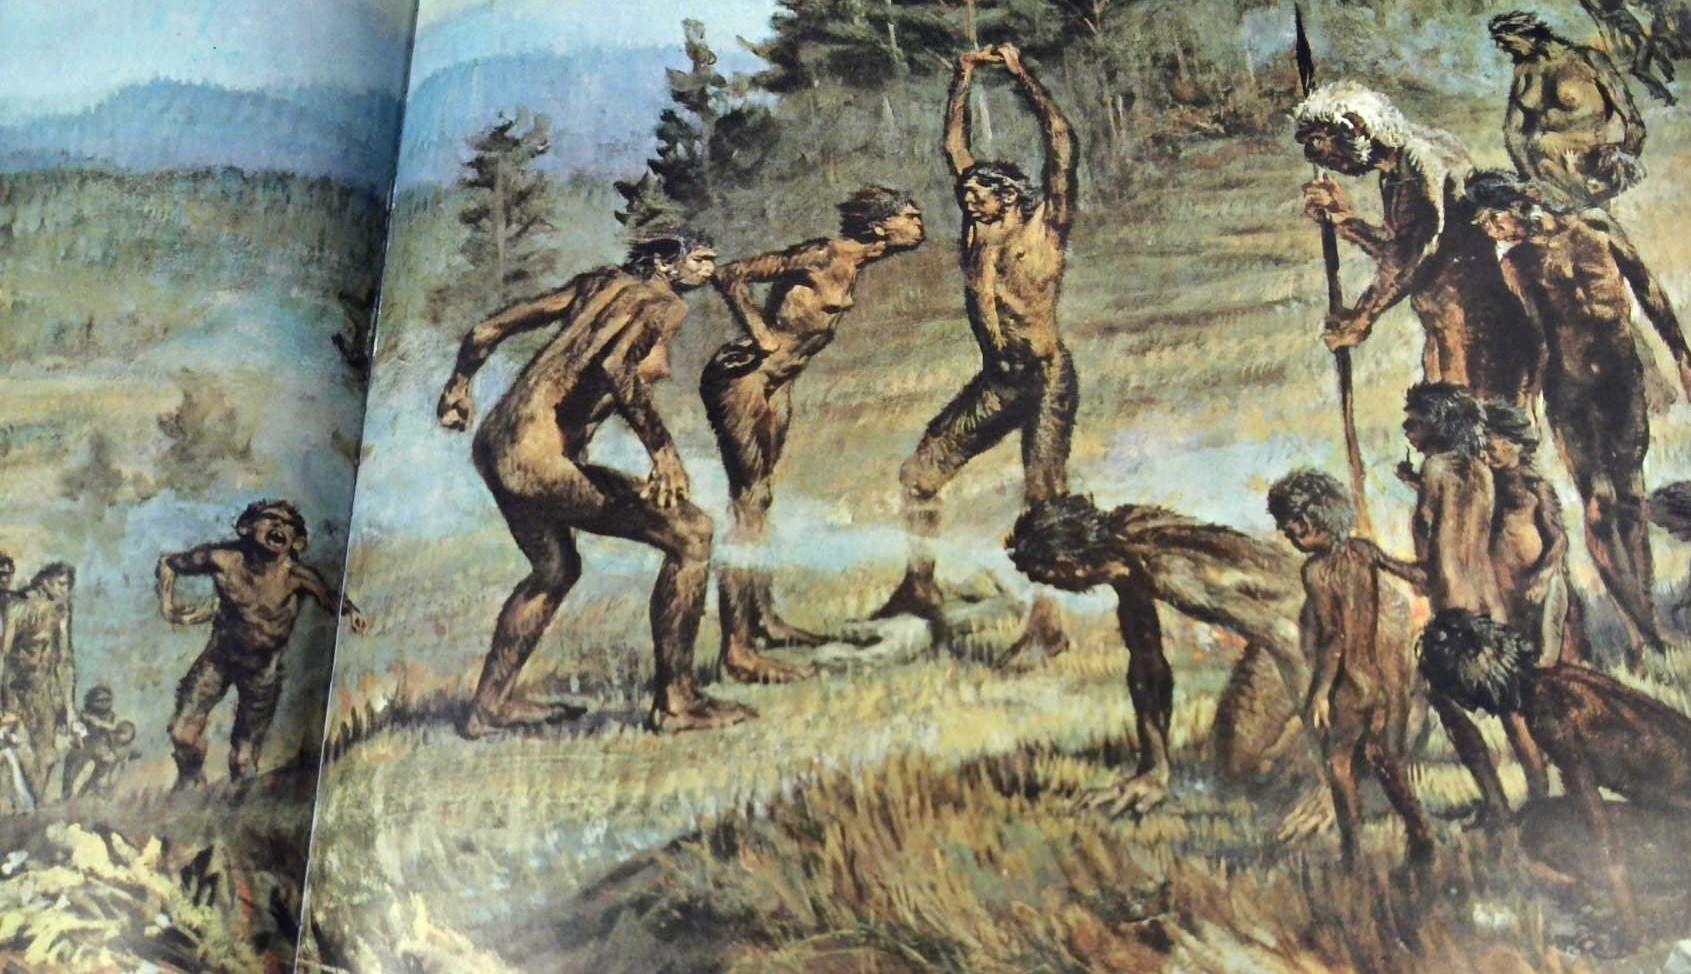 Homo erectus, fide F.C. Howell (1968).